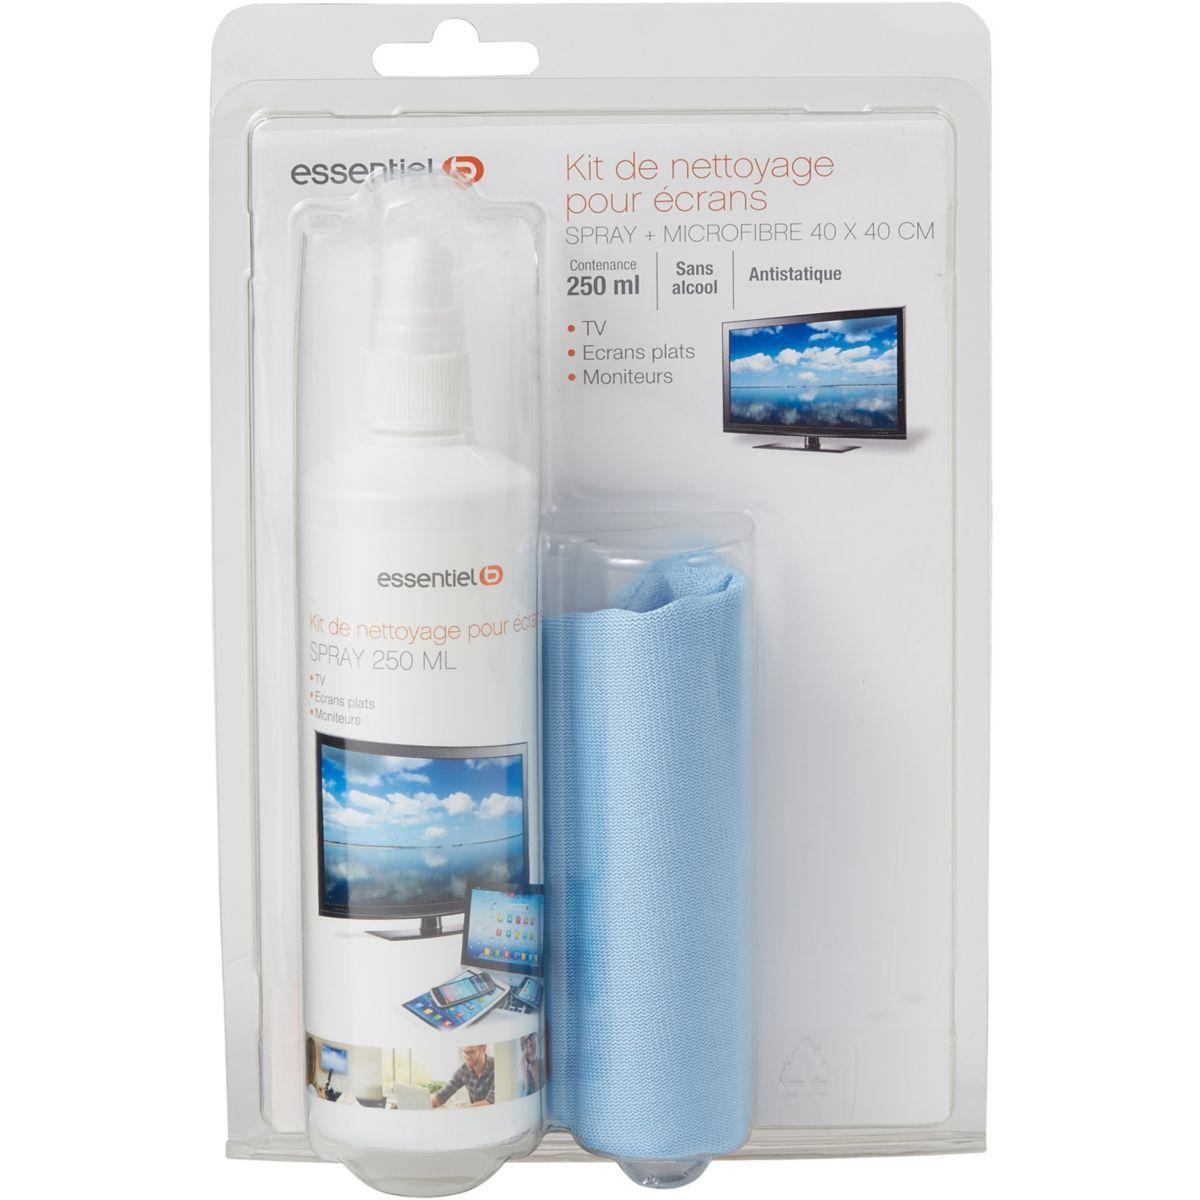 Kit sc spray 250ml+micro fibre 2 (photo)